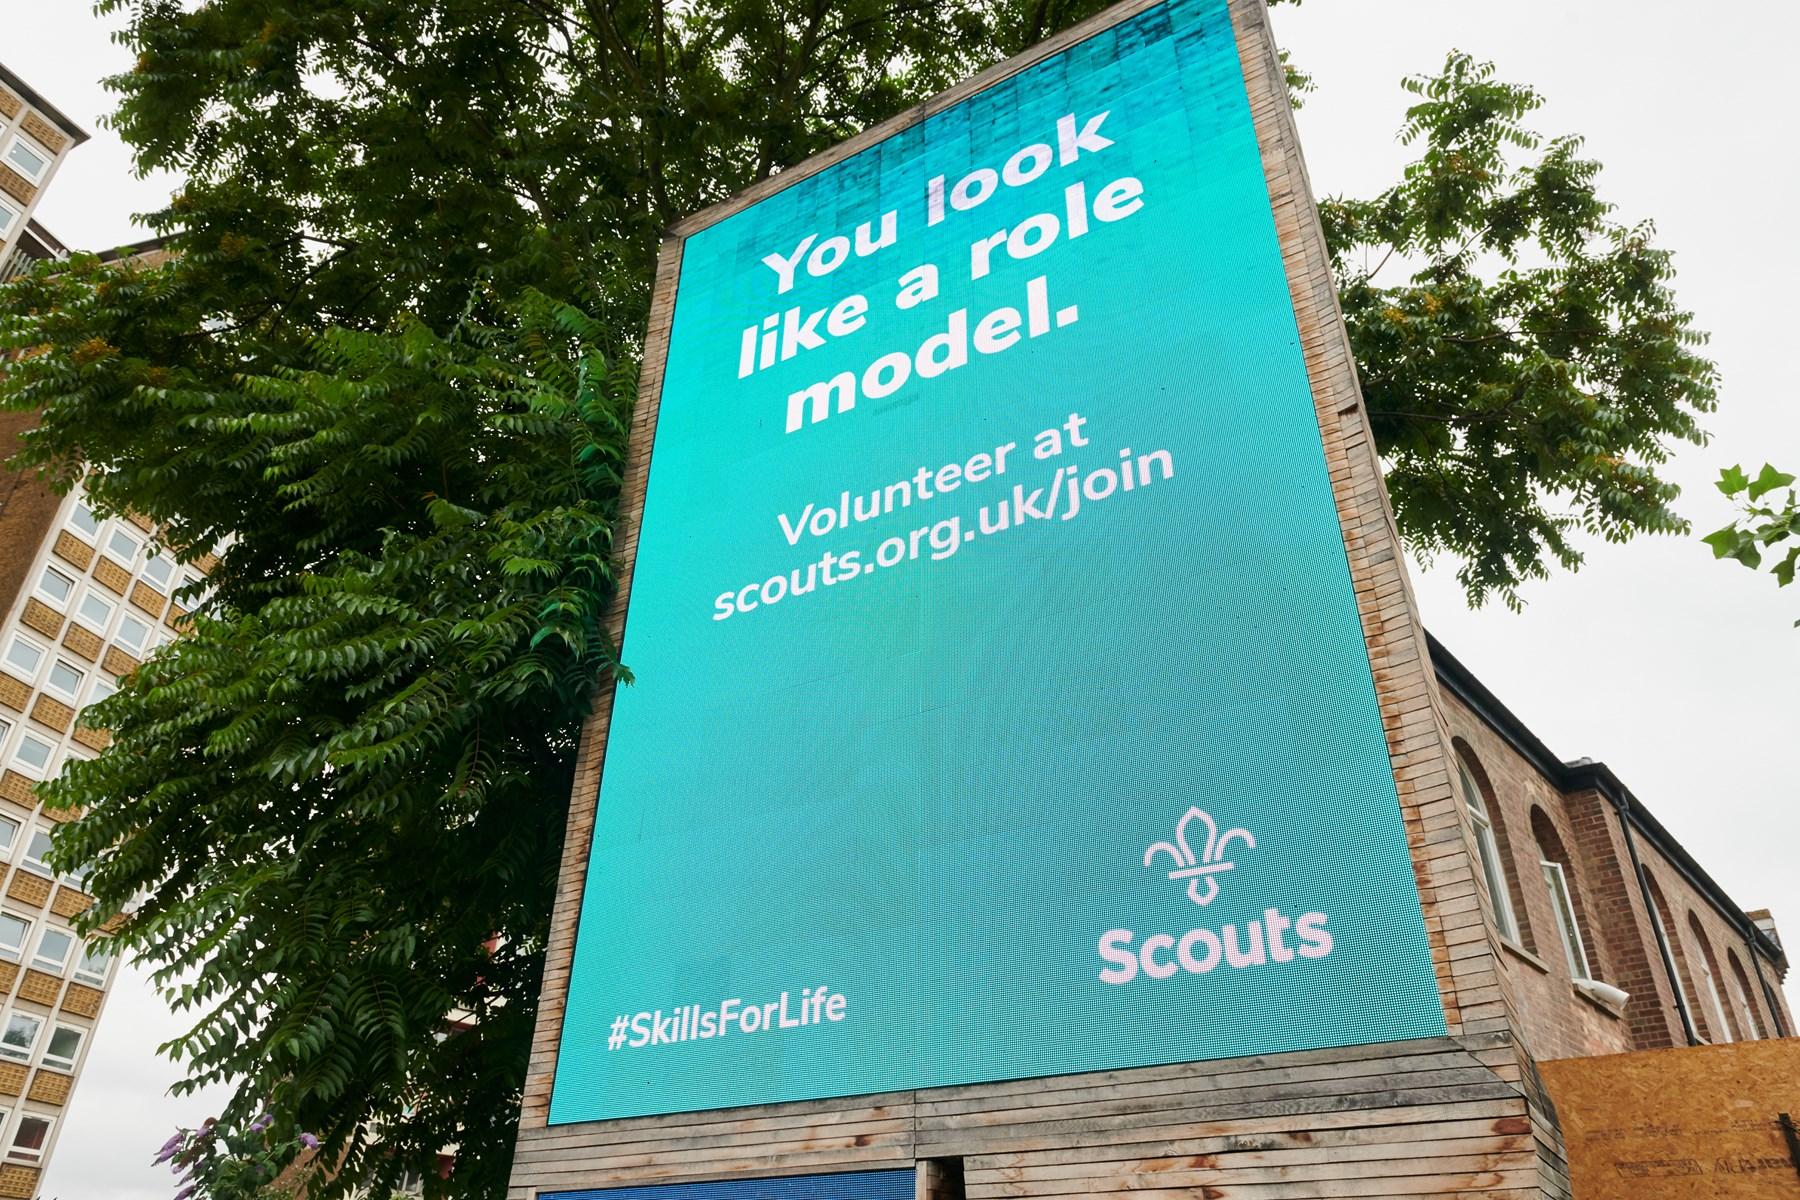 Scouts volunteer billboard